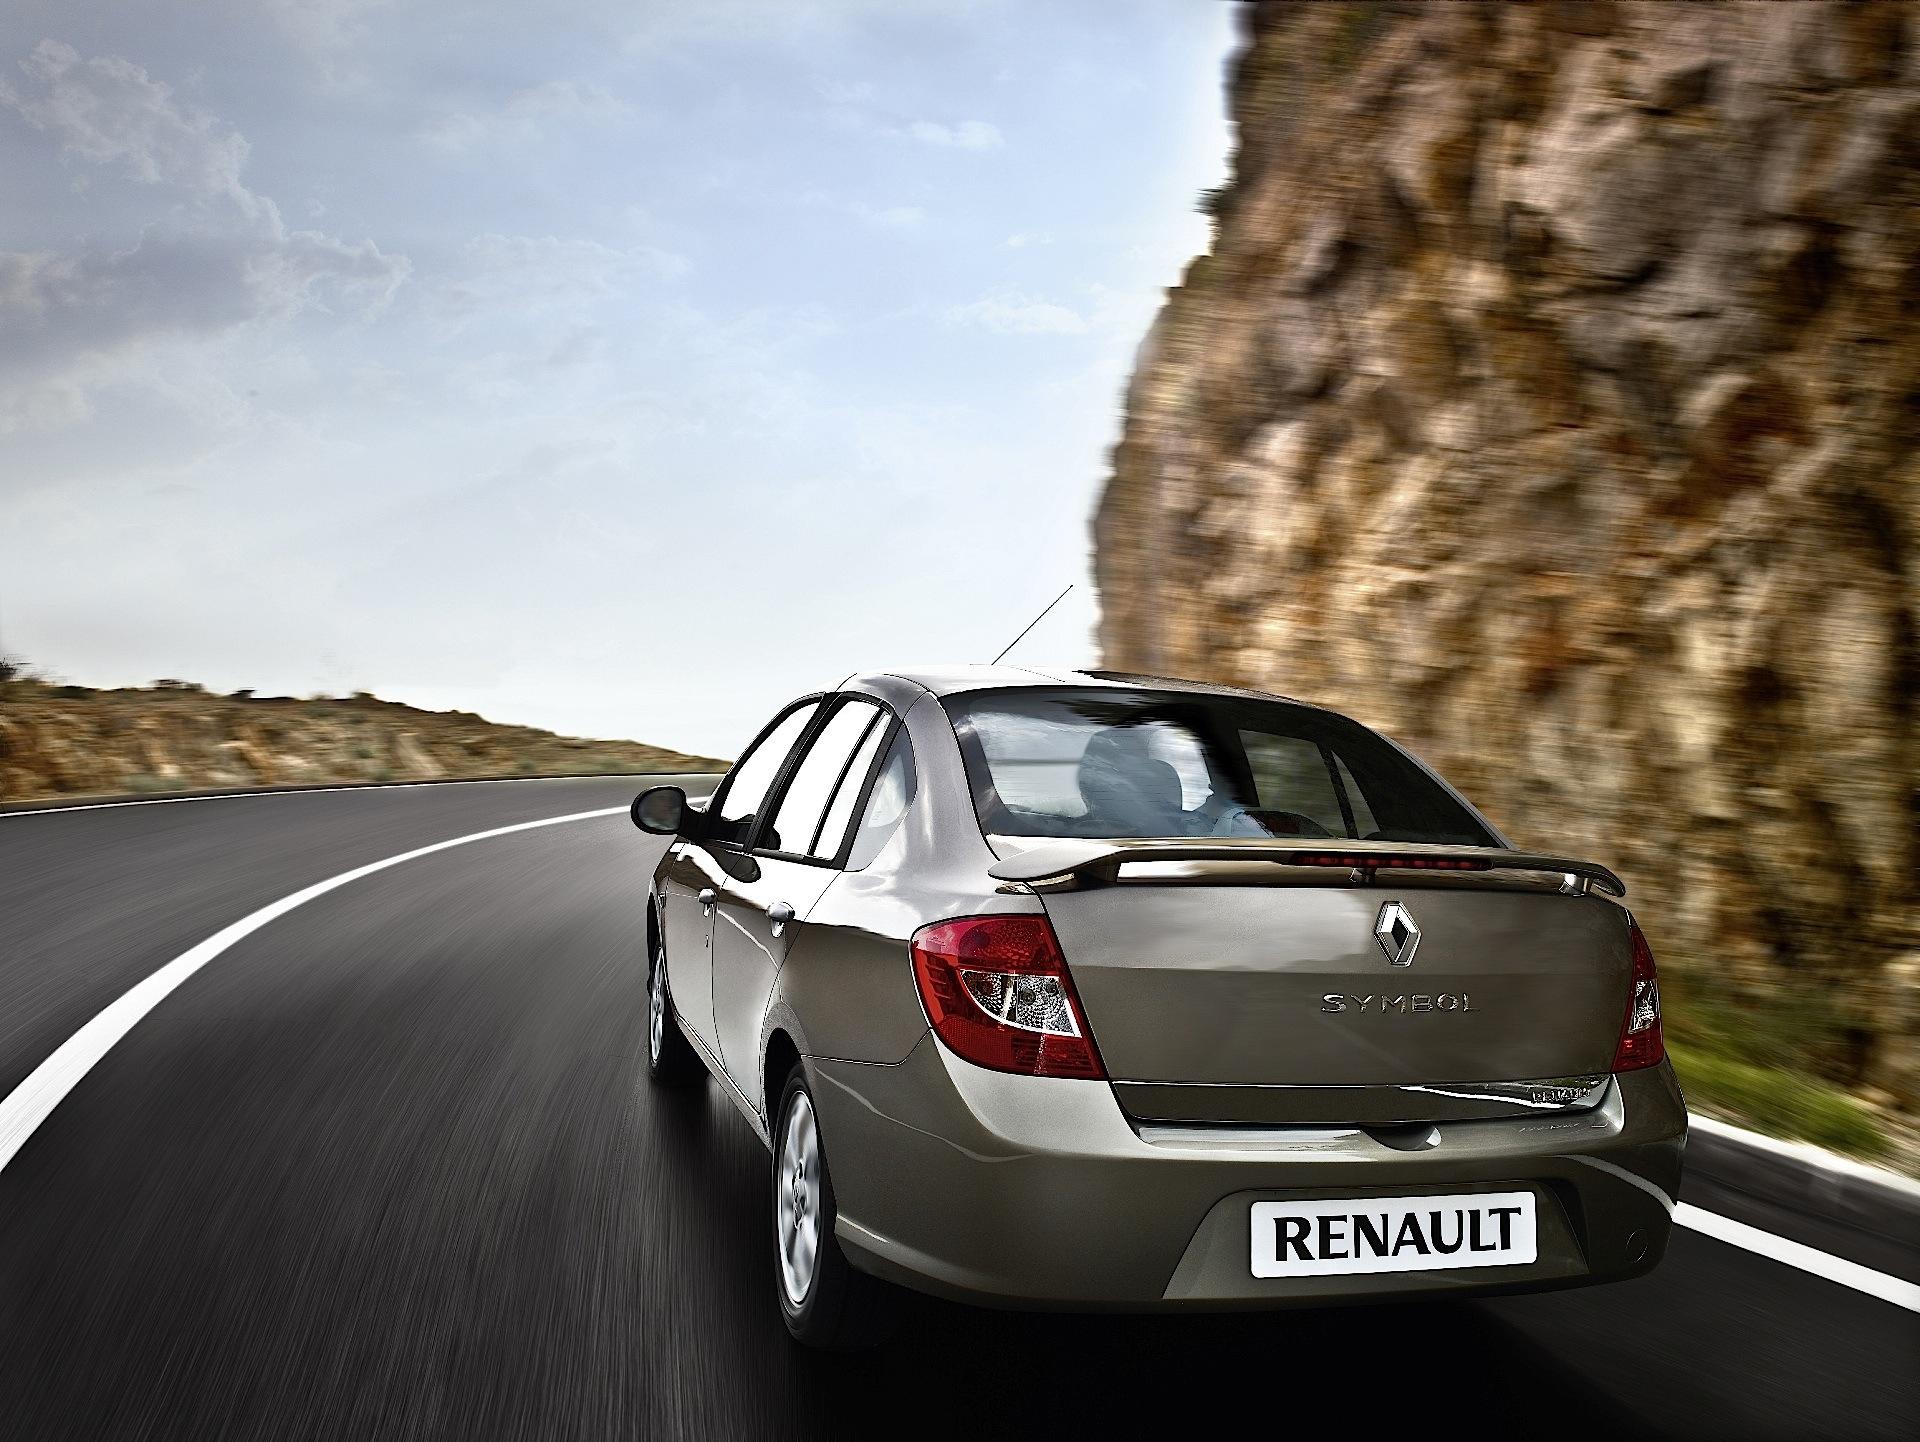 Renault Clio Symbolthalia Specs Photos 2006 2007 2008 2009